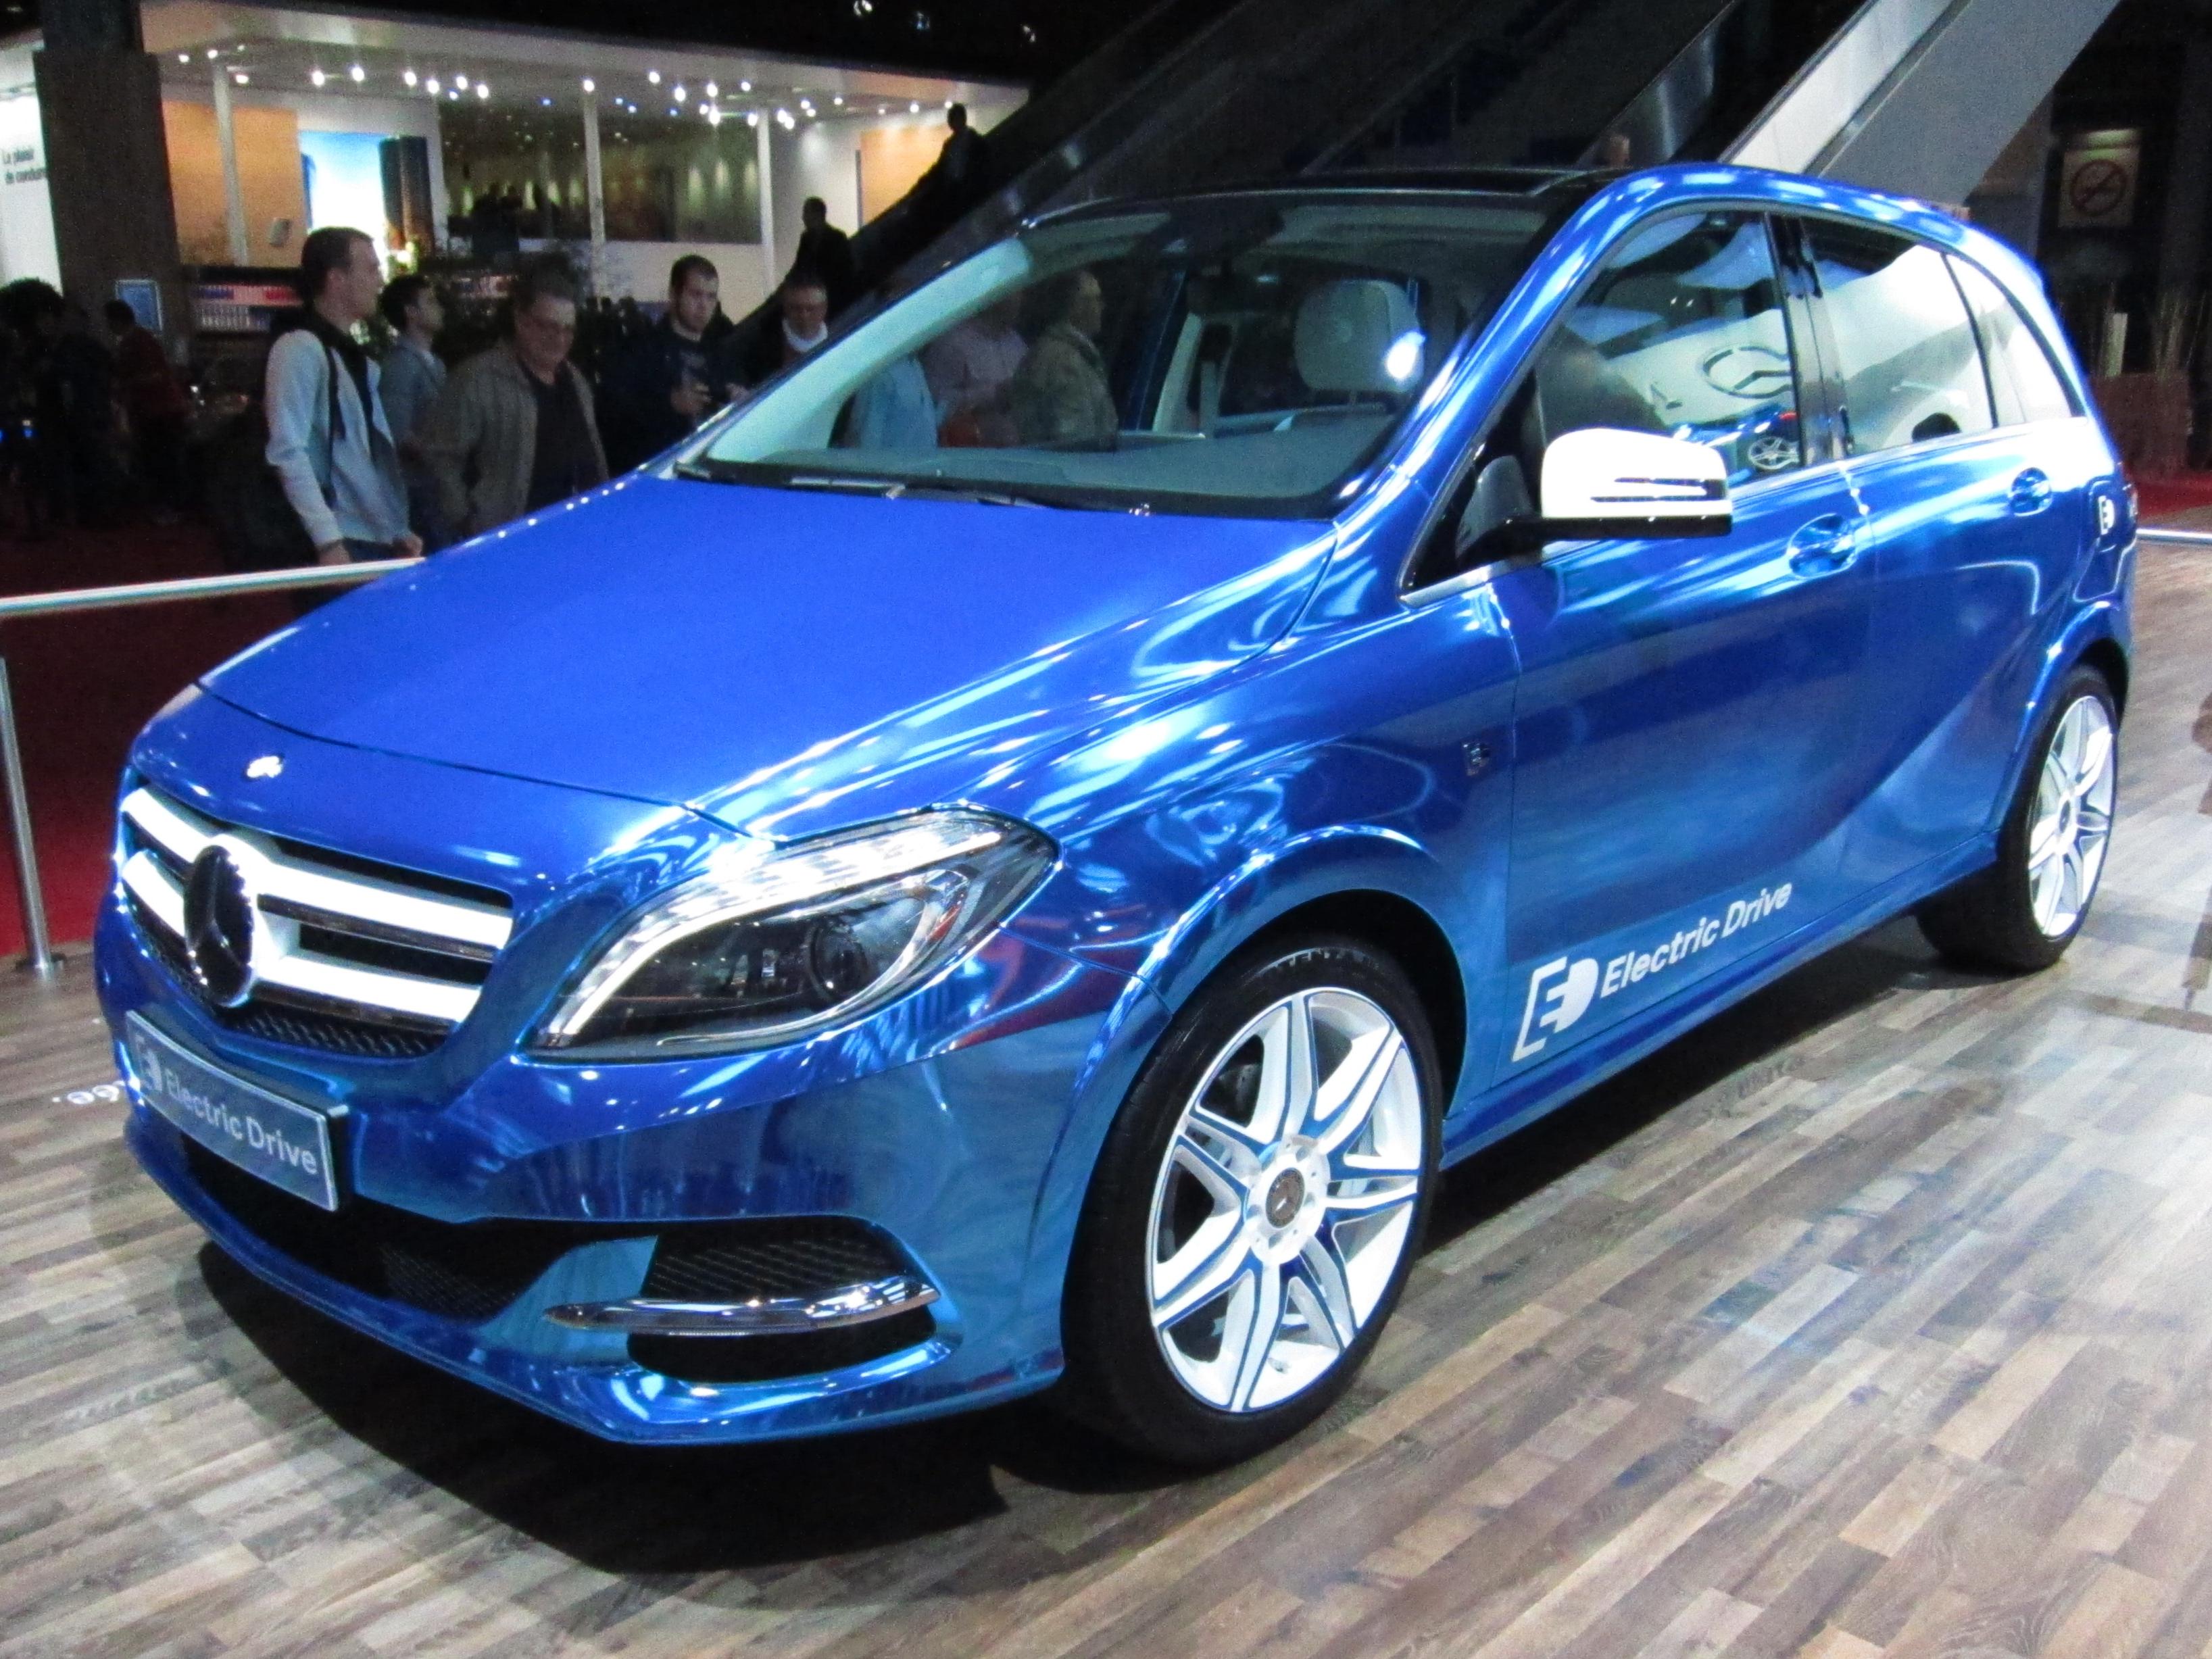 File:Mercedes Benz B Class Electric Drive (front Quarter).JPG